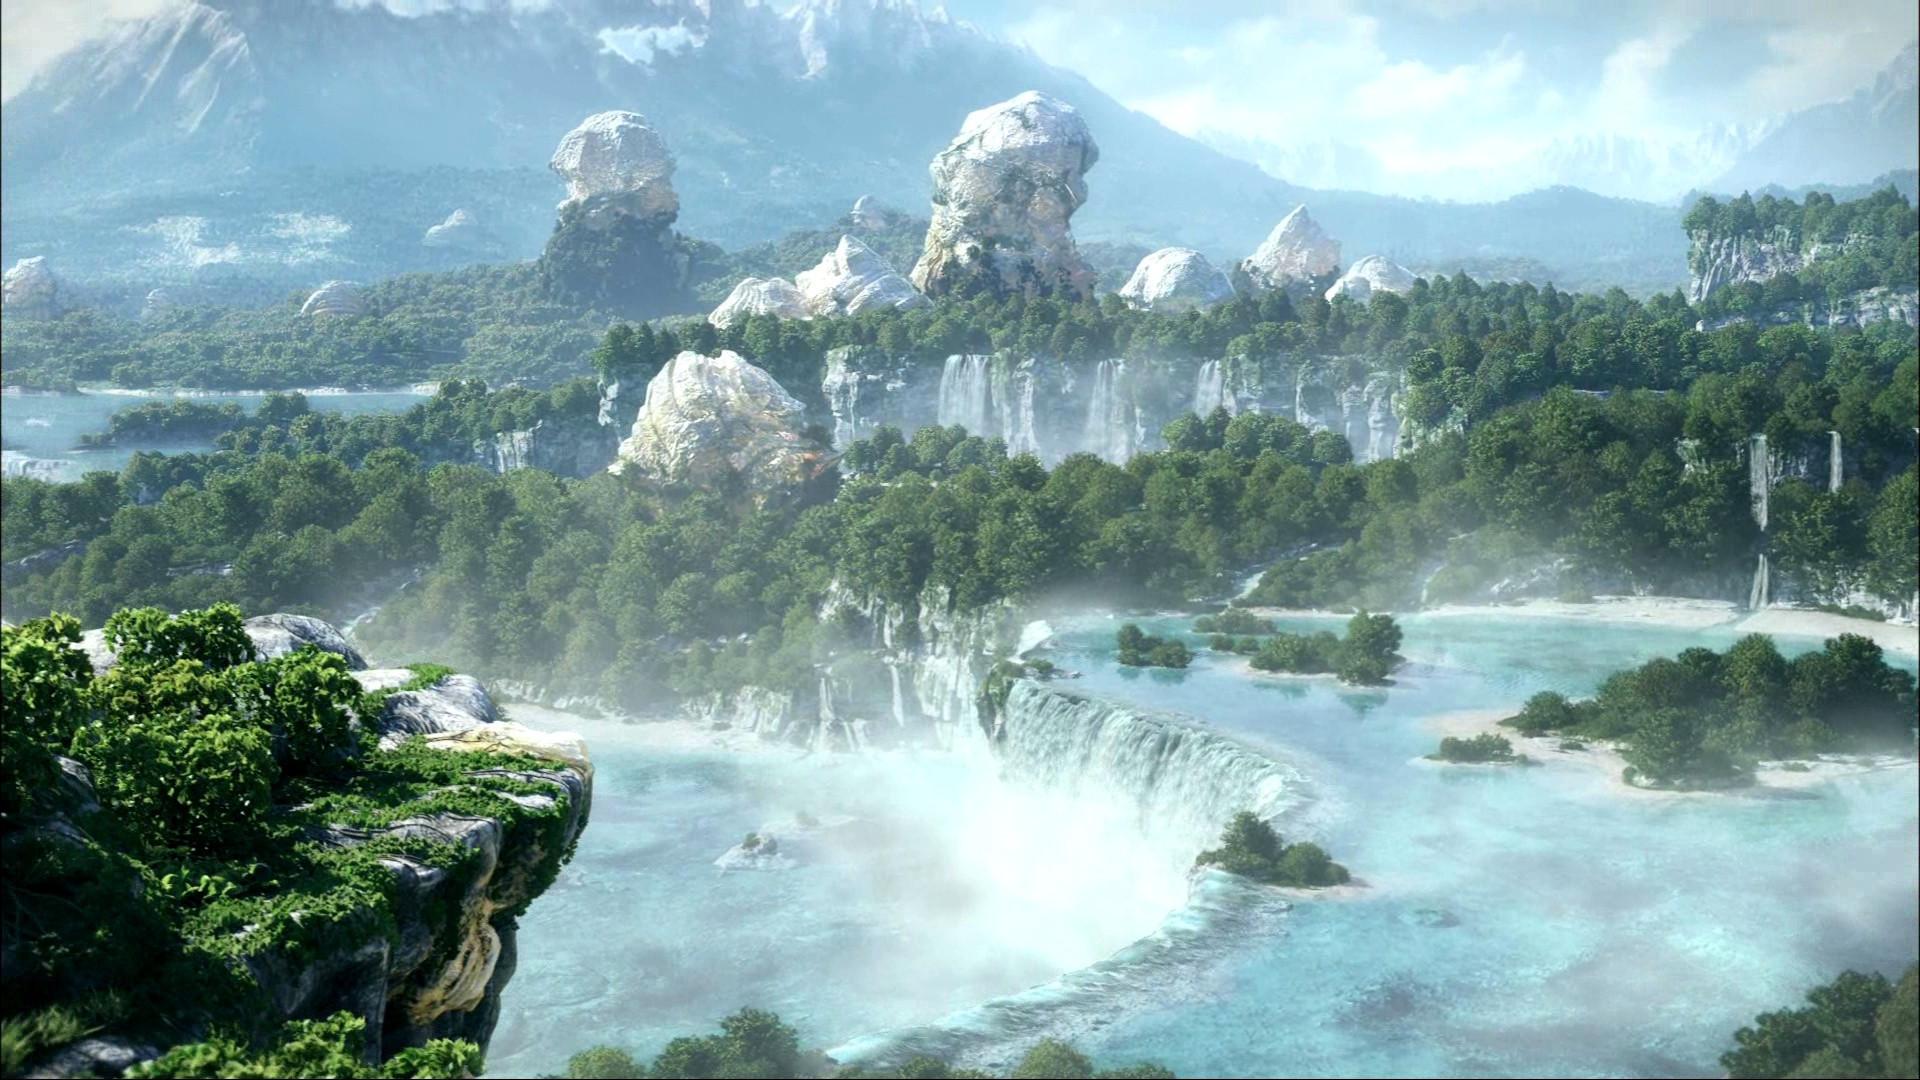 Wallpapers For > Final Fantasy Xiv Wallpaper 1080p